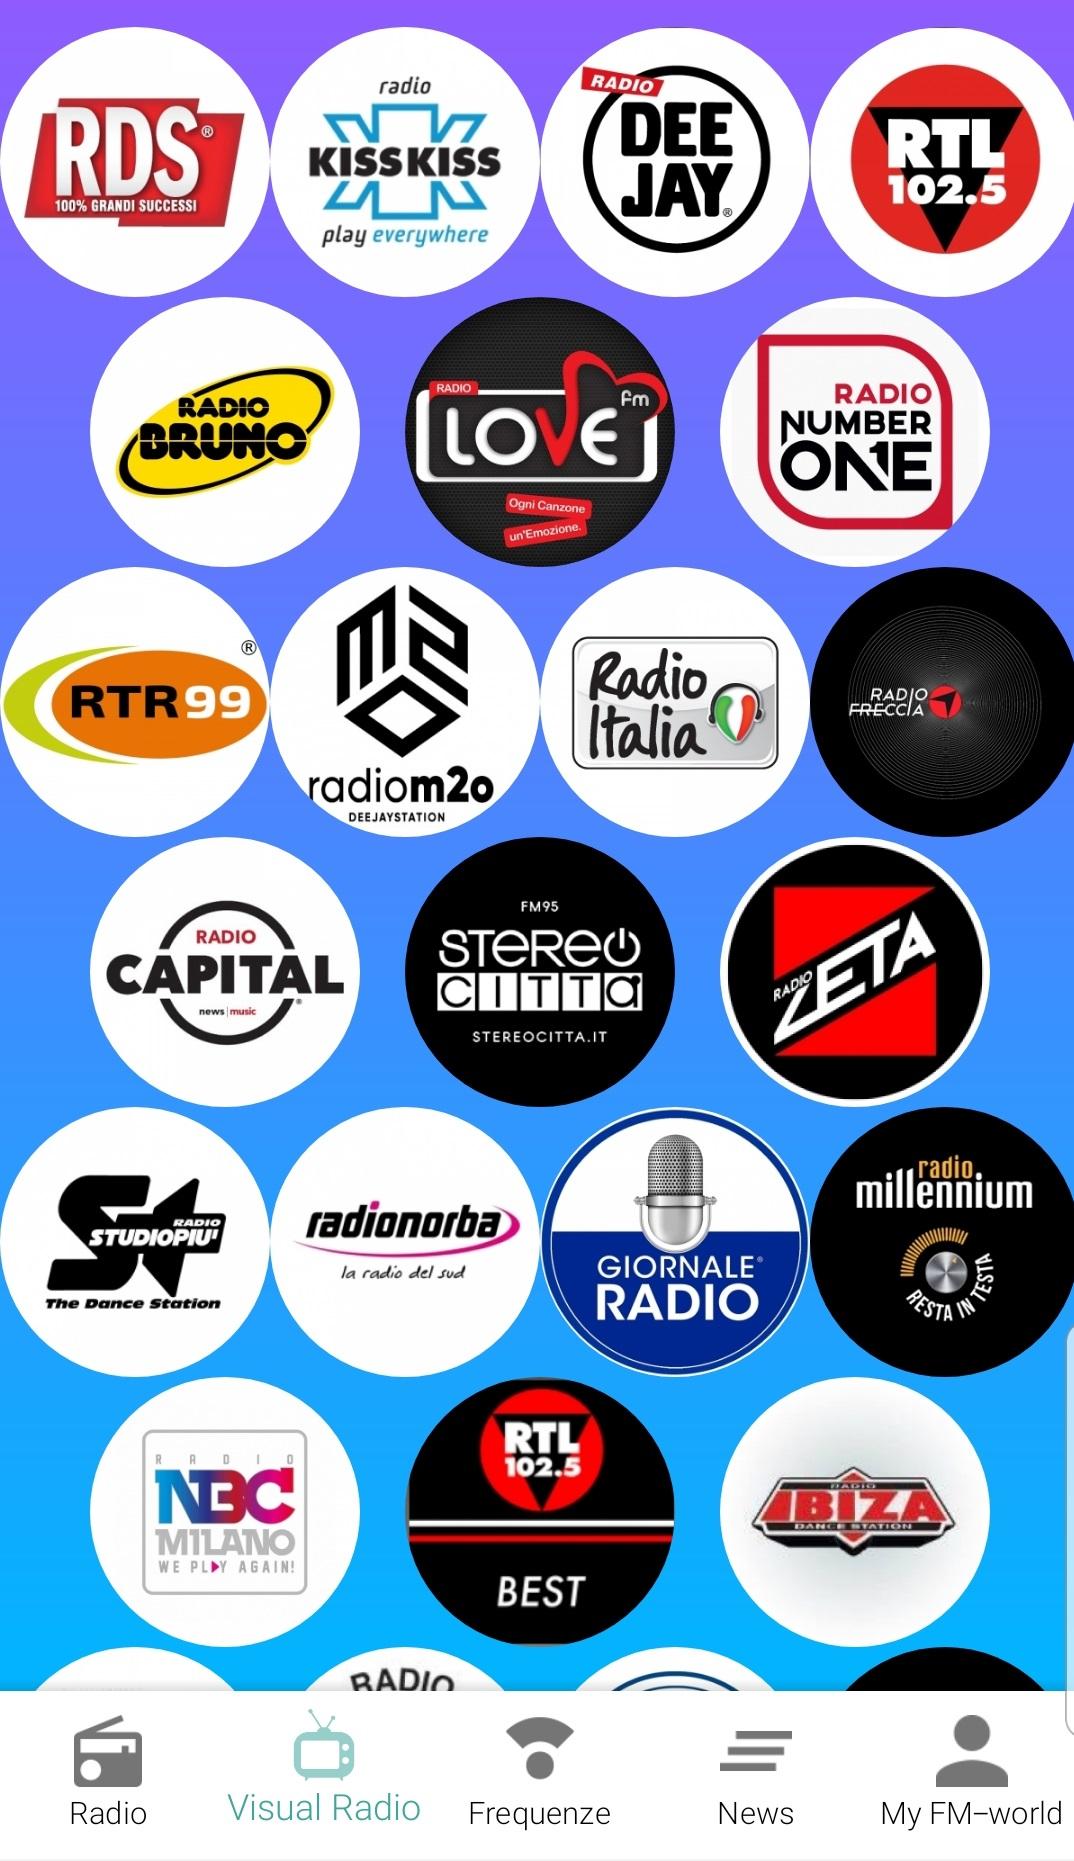 multipiattaforma, visual radio, fm world